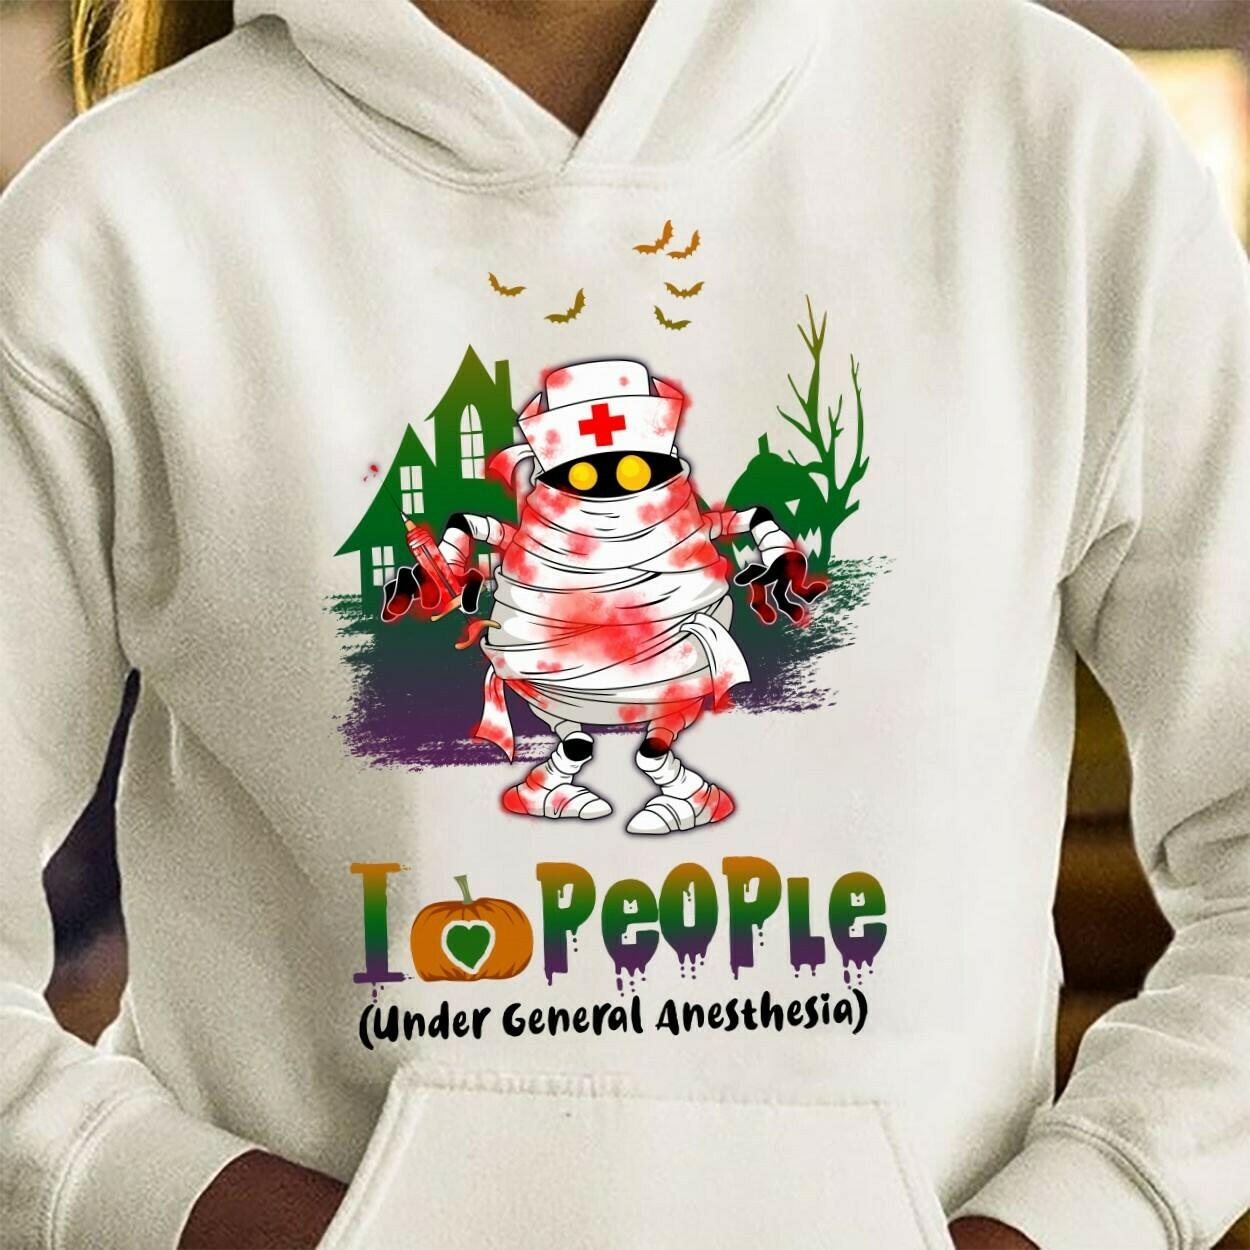 Zombie Nurse I Love People gift for Love Nurselife Heartbeats Nursing Student Graduation School RN Registered On Halloween Day T-Shirt Long Sleeve Sweatshirt Hoodie Jolly Family Gifts